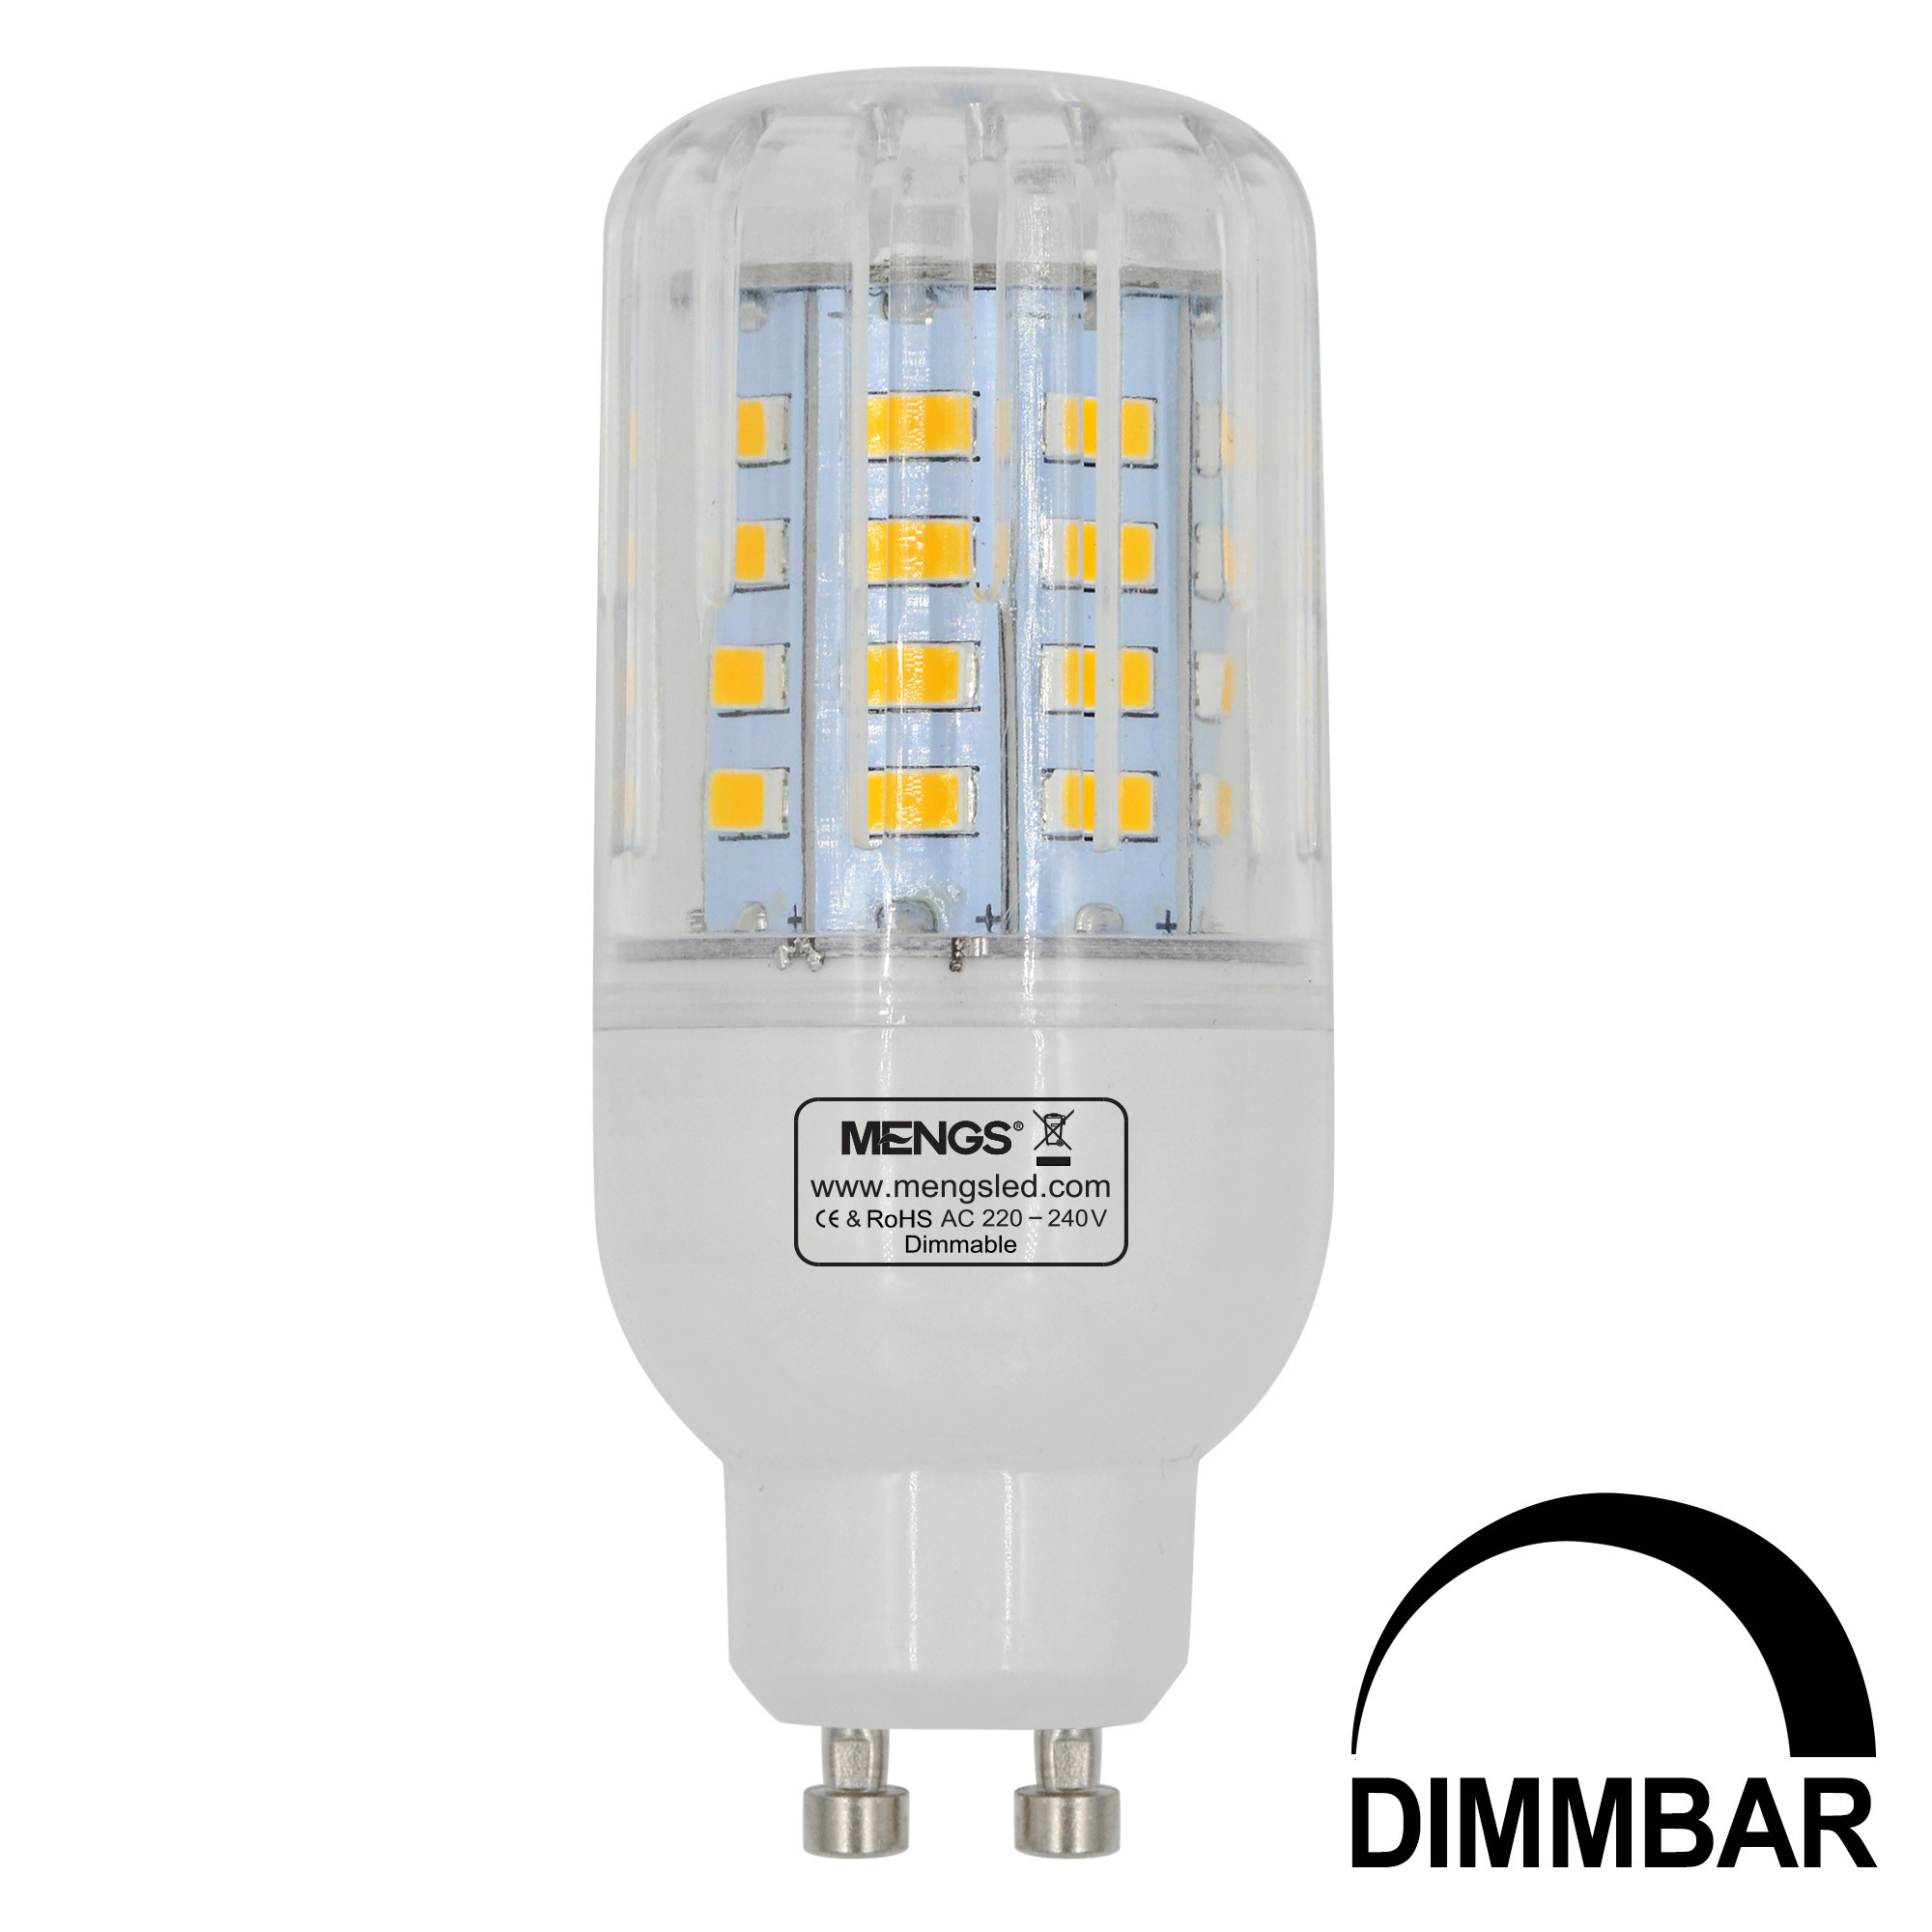 MENGS® GU10 5W LED Dimmable Corn Light 40x 5736 SMD LED Bulb Lamp AC 220-240V In Warm White Energy-Saving Light